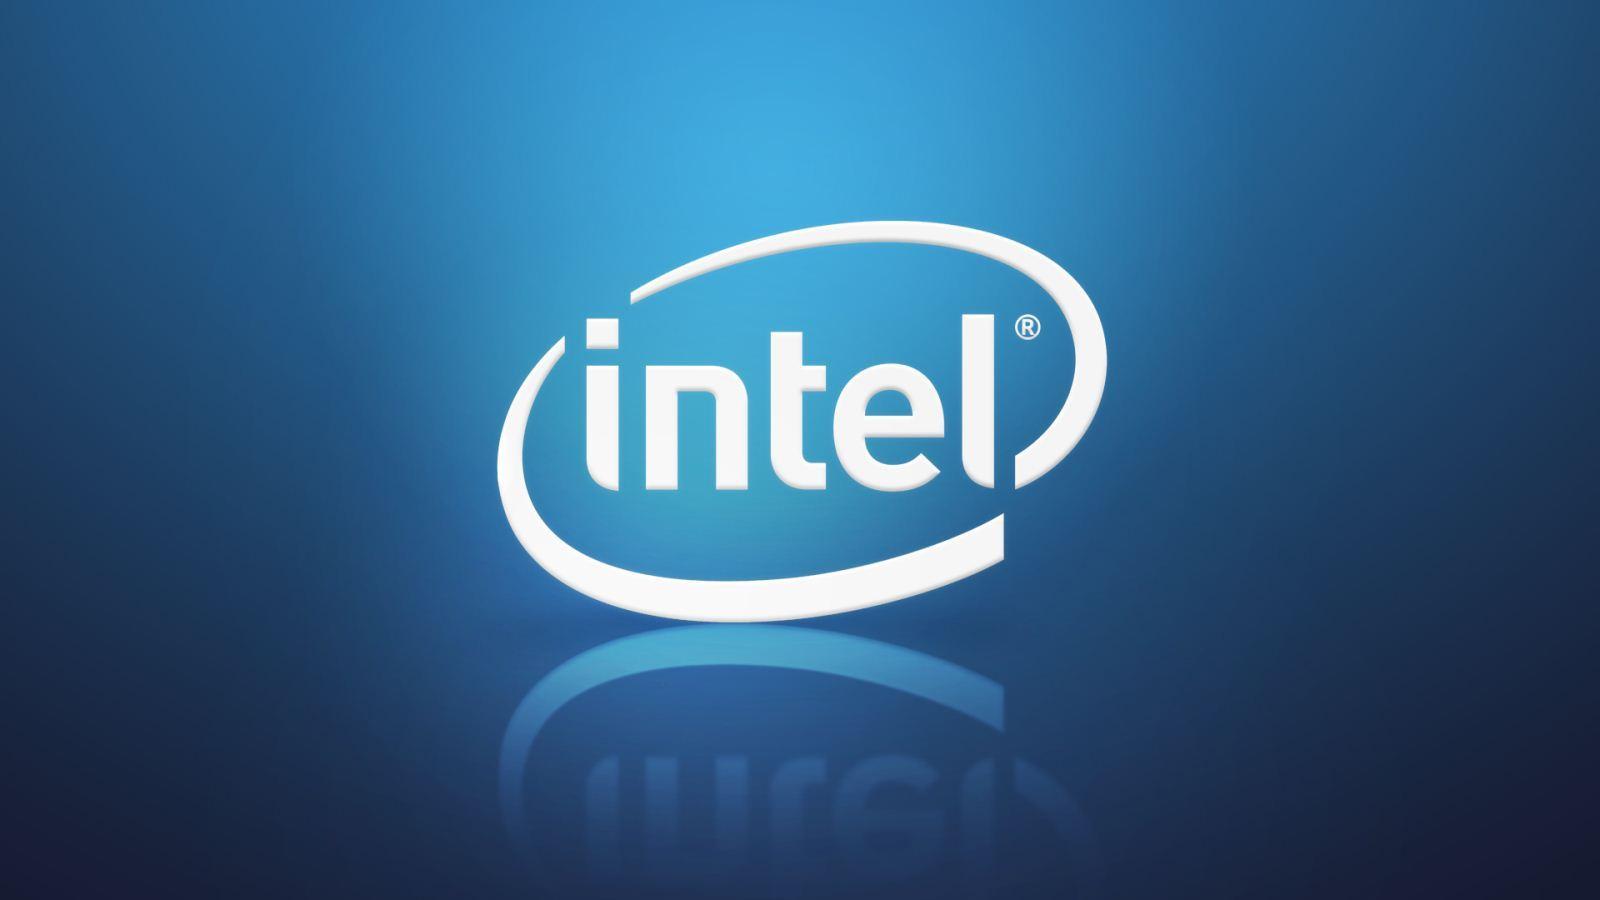 intel最贵i3开卖售价超一千,网友:且卖且珍惜